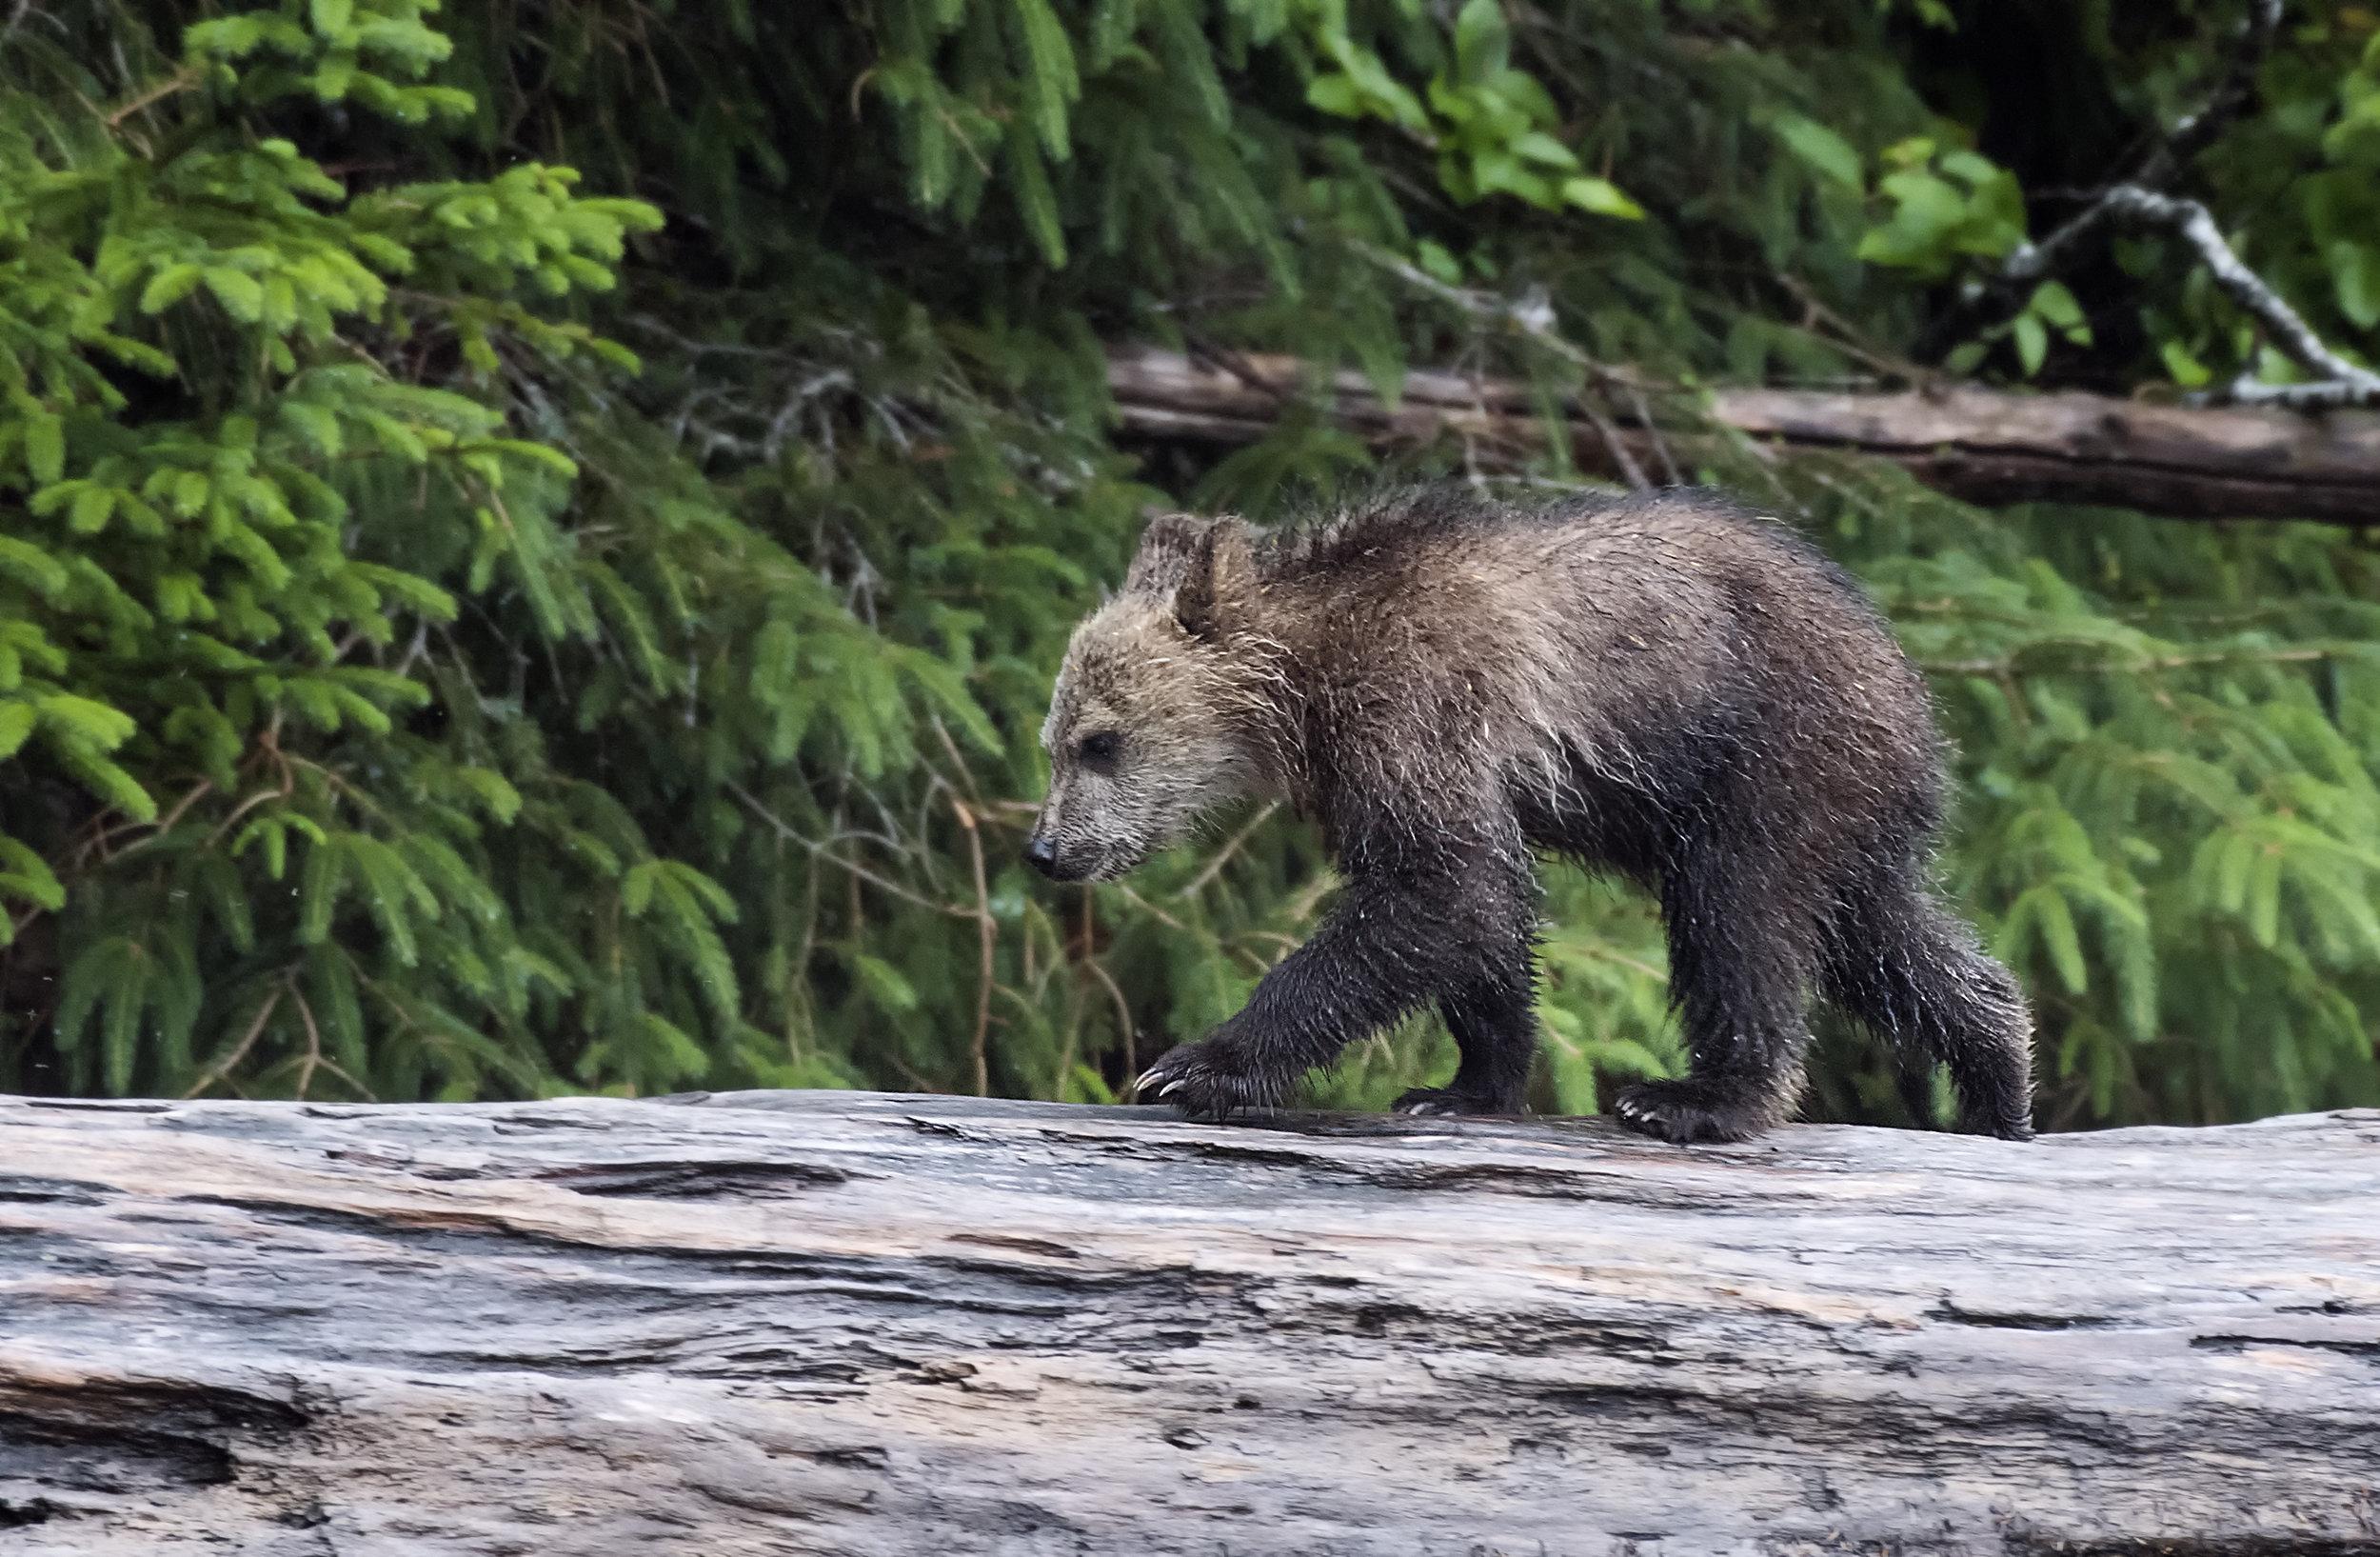 young cub on a log .jpg